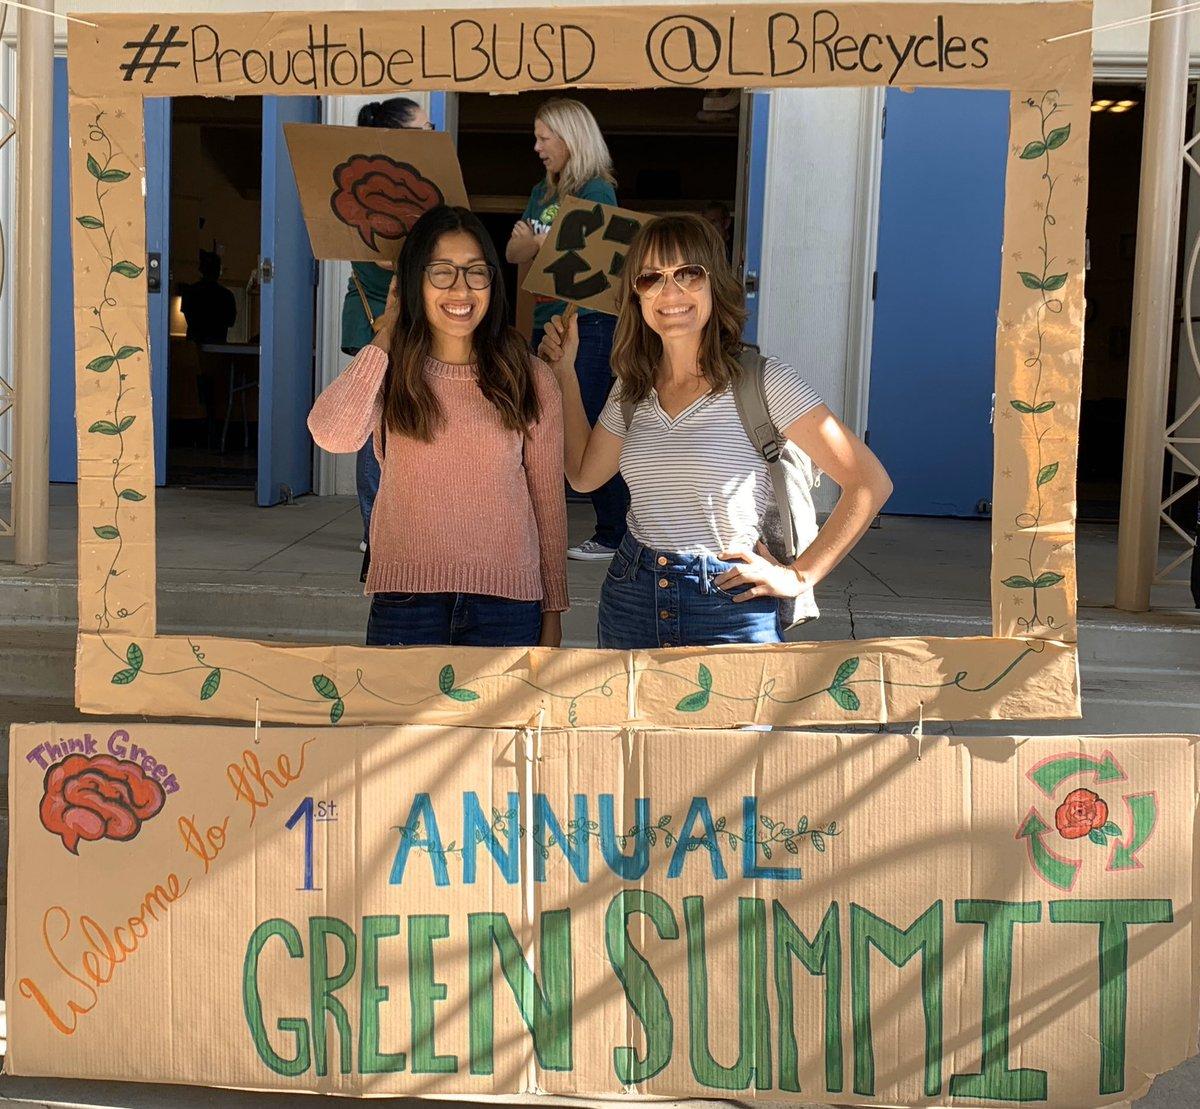 First annual Green Summit! Representing @WhittierLBUSD 😎 #proudtobeLBUSD @Ms_KelseyCooper